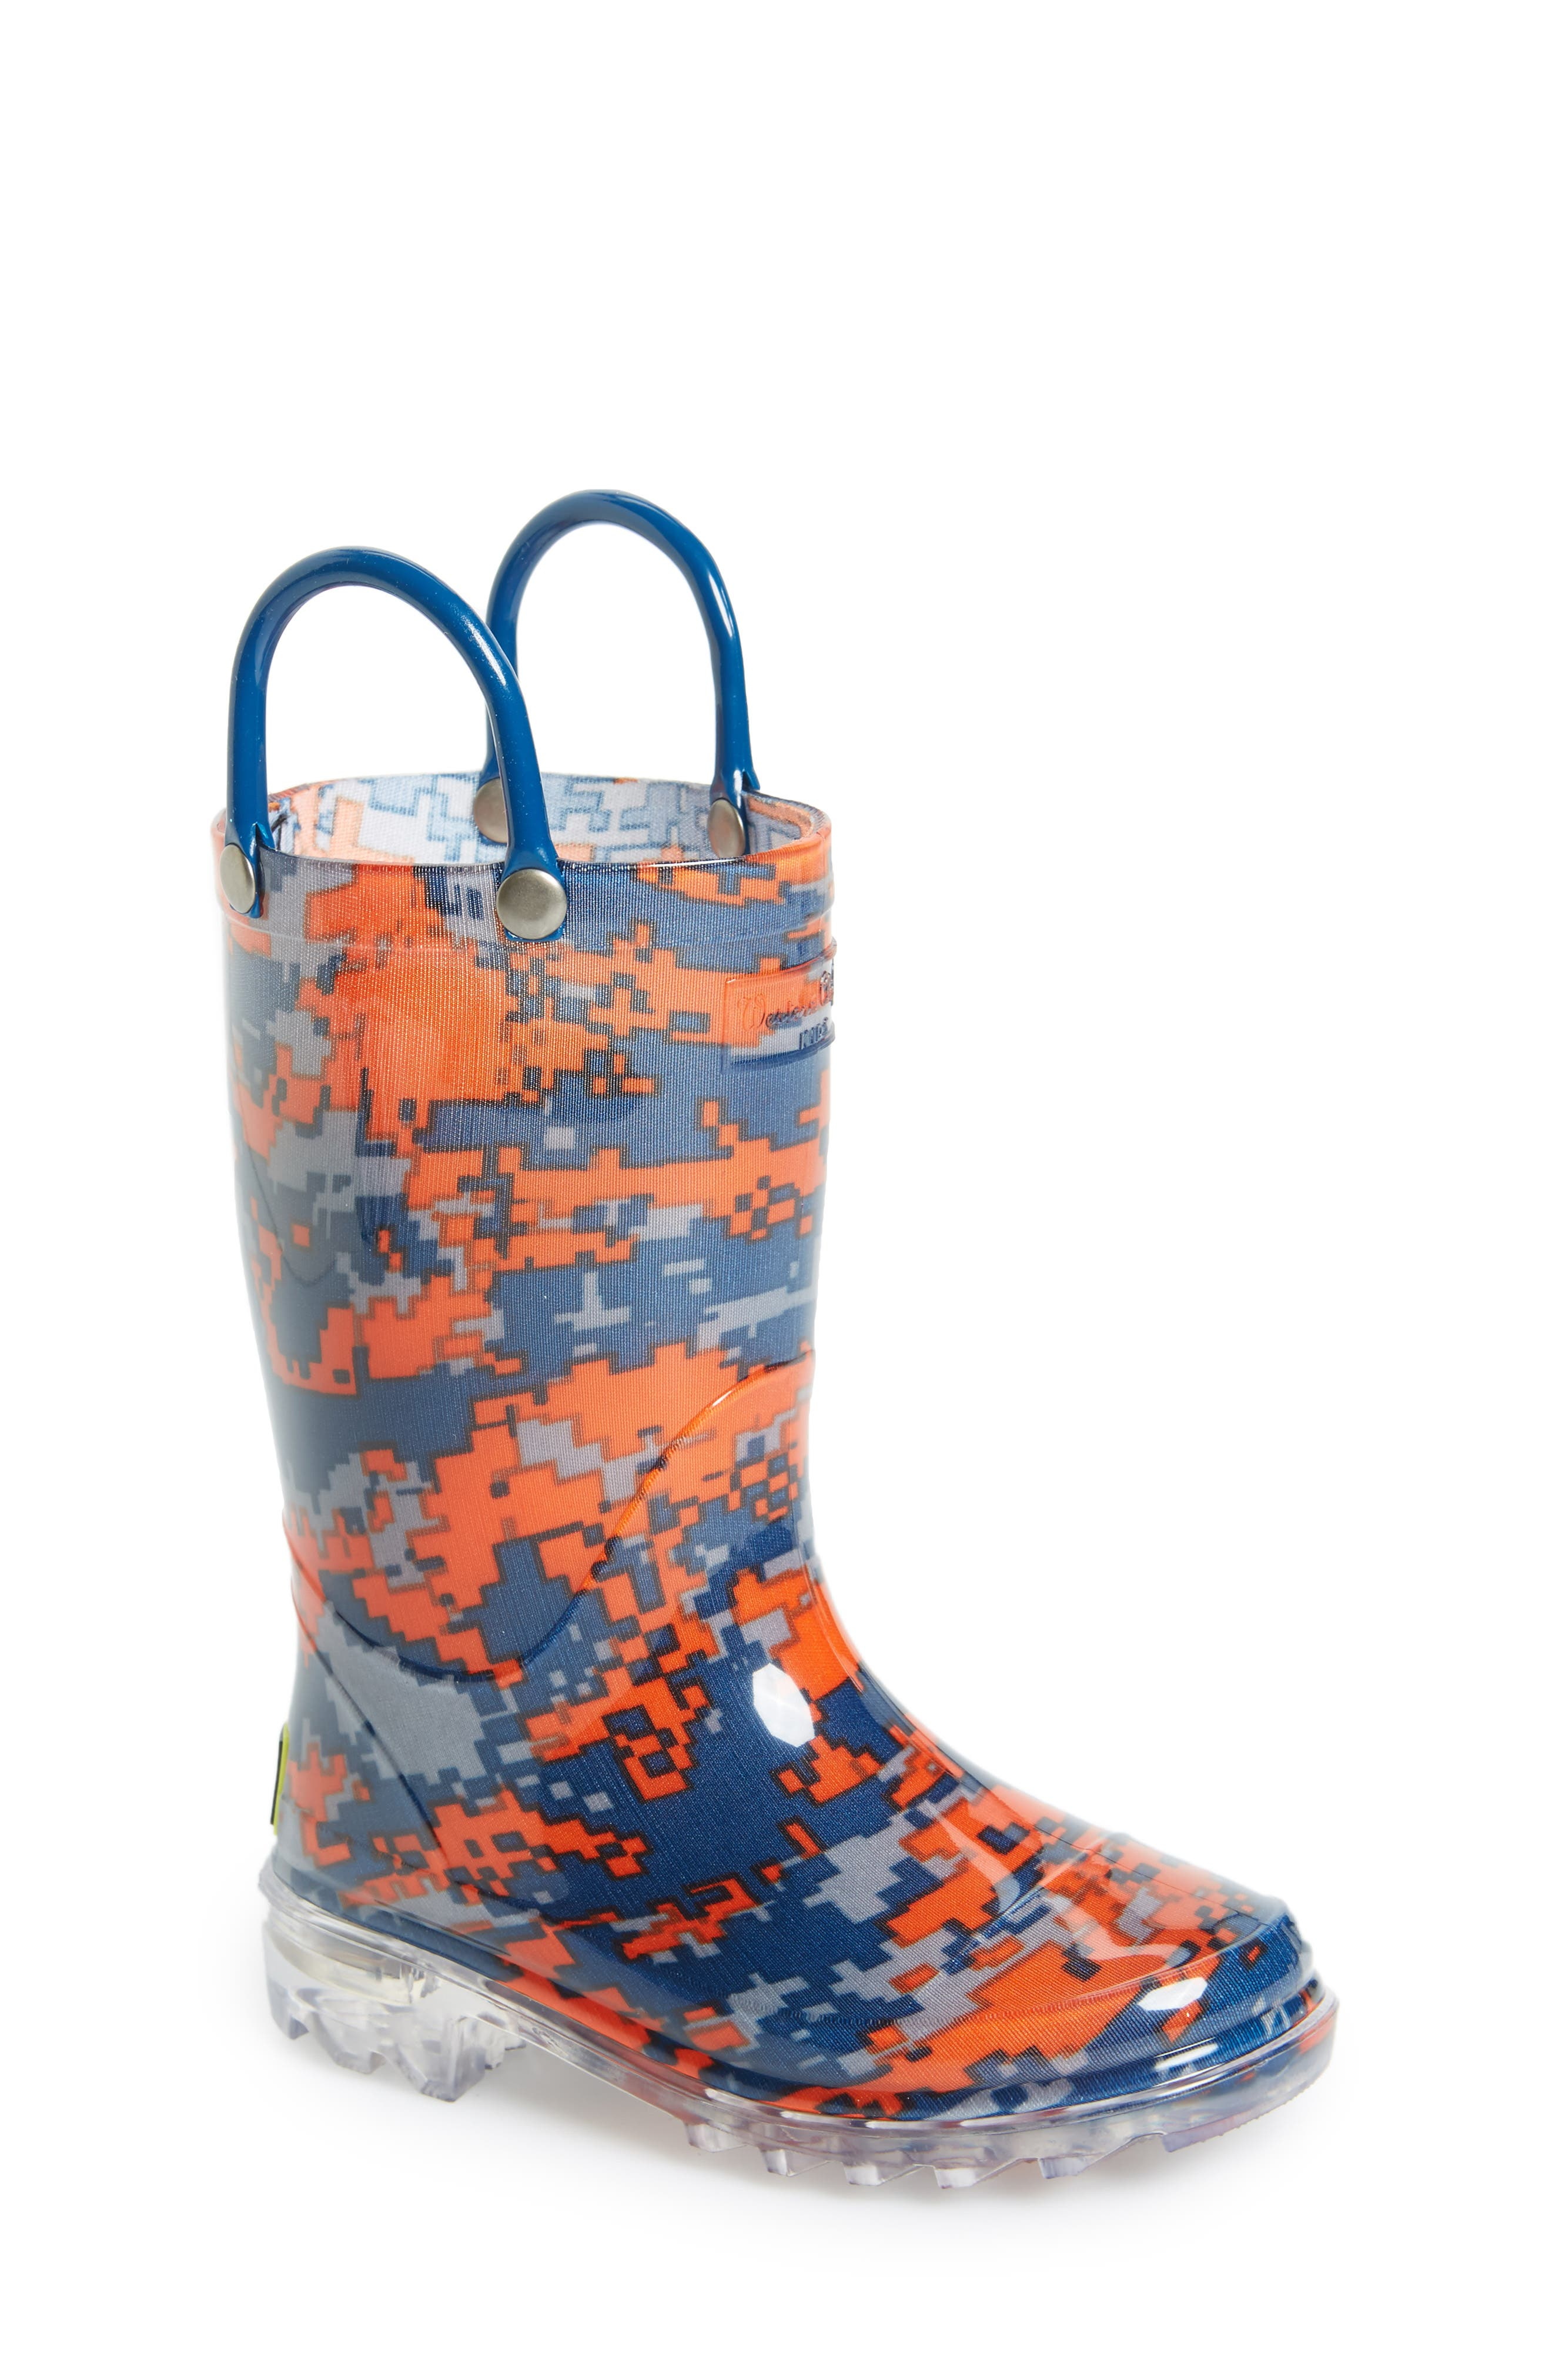 Alternate Image 1 Selected - Western Chief Digital Camo Light-Up Rain Boot (Toddler & Little Kid)